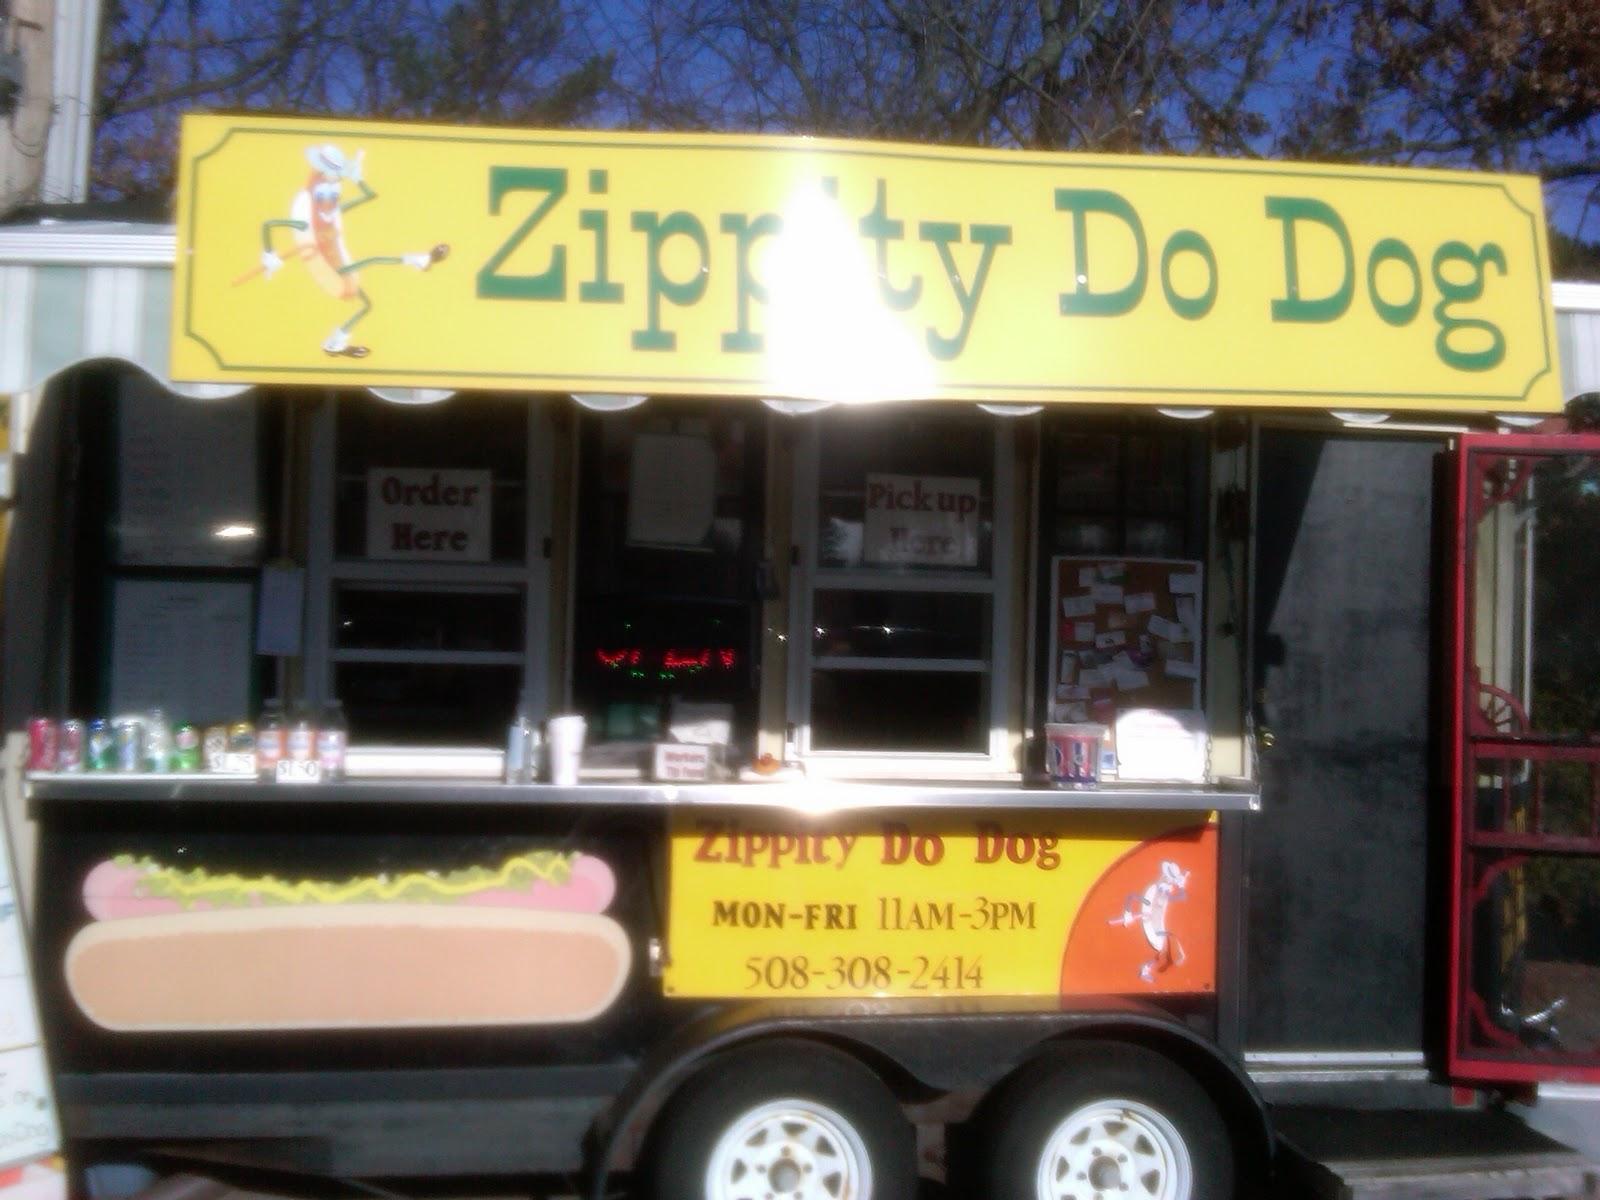 The Hot Dog Truck: Hot Dog Trailer for Sale in Framingham, MA